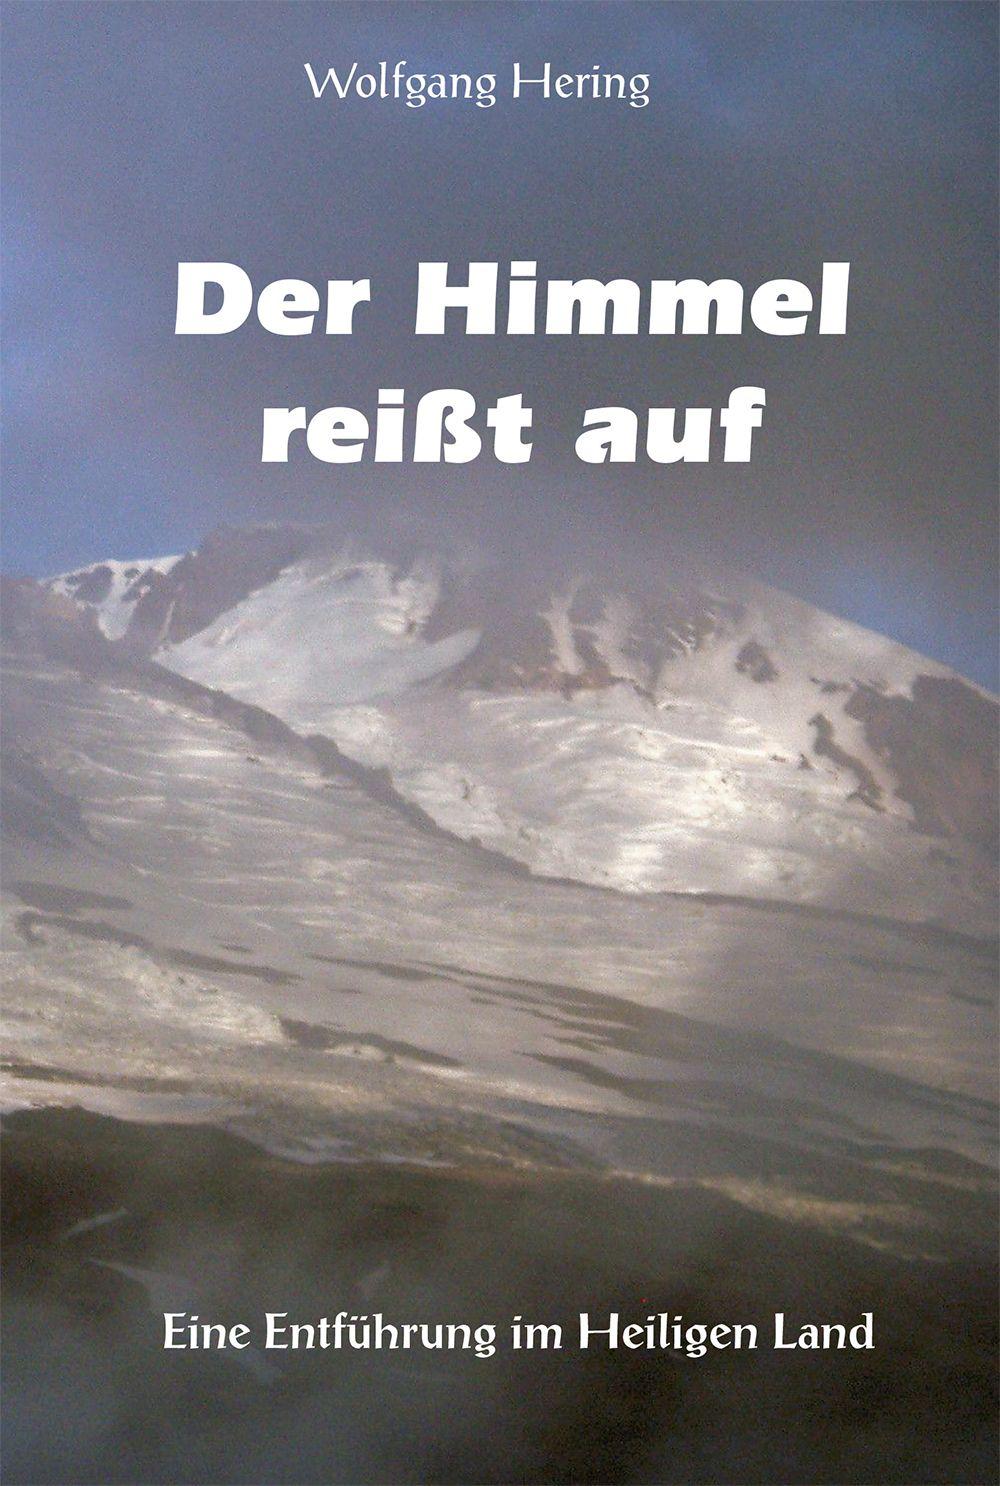 Kreuzfahrten-247.de - Kreuzfahrt Infos & Kreuzfahrt Tipps | Verlag Kern